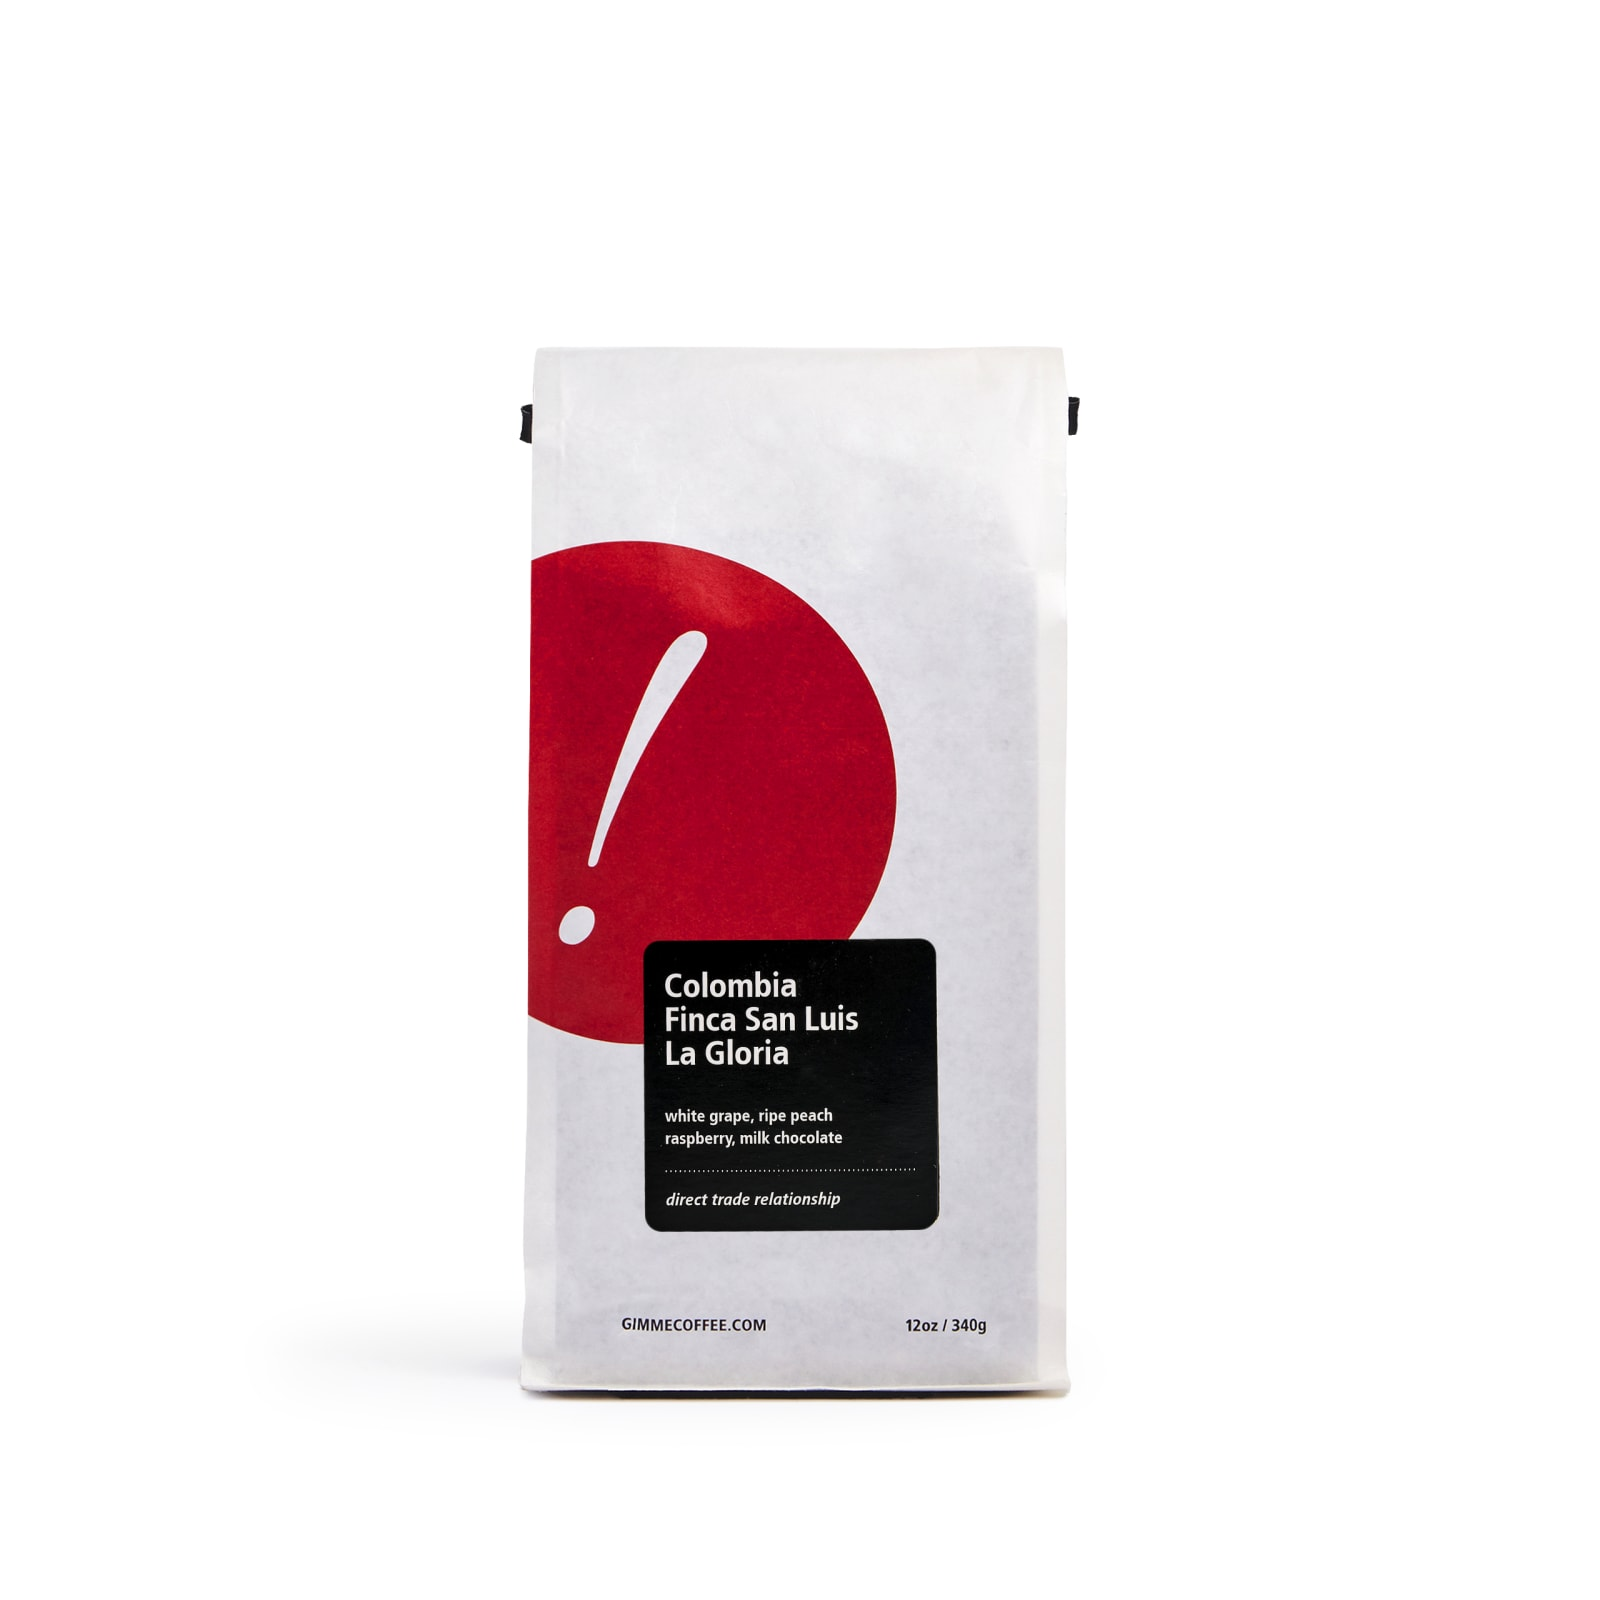 Colombia Finca San Luis - 5 lb bag